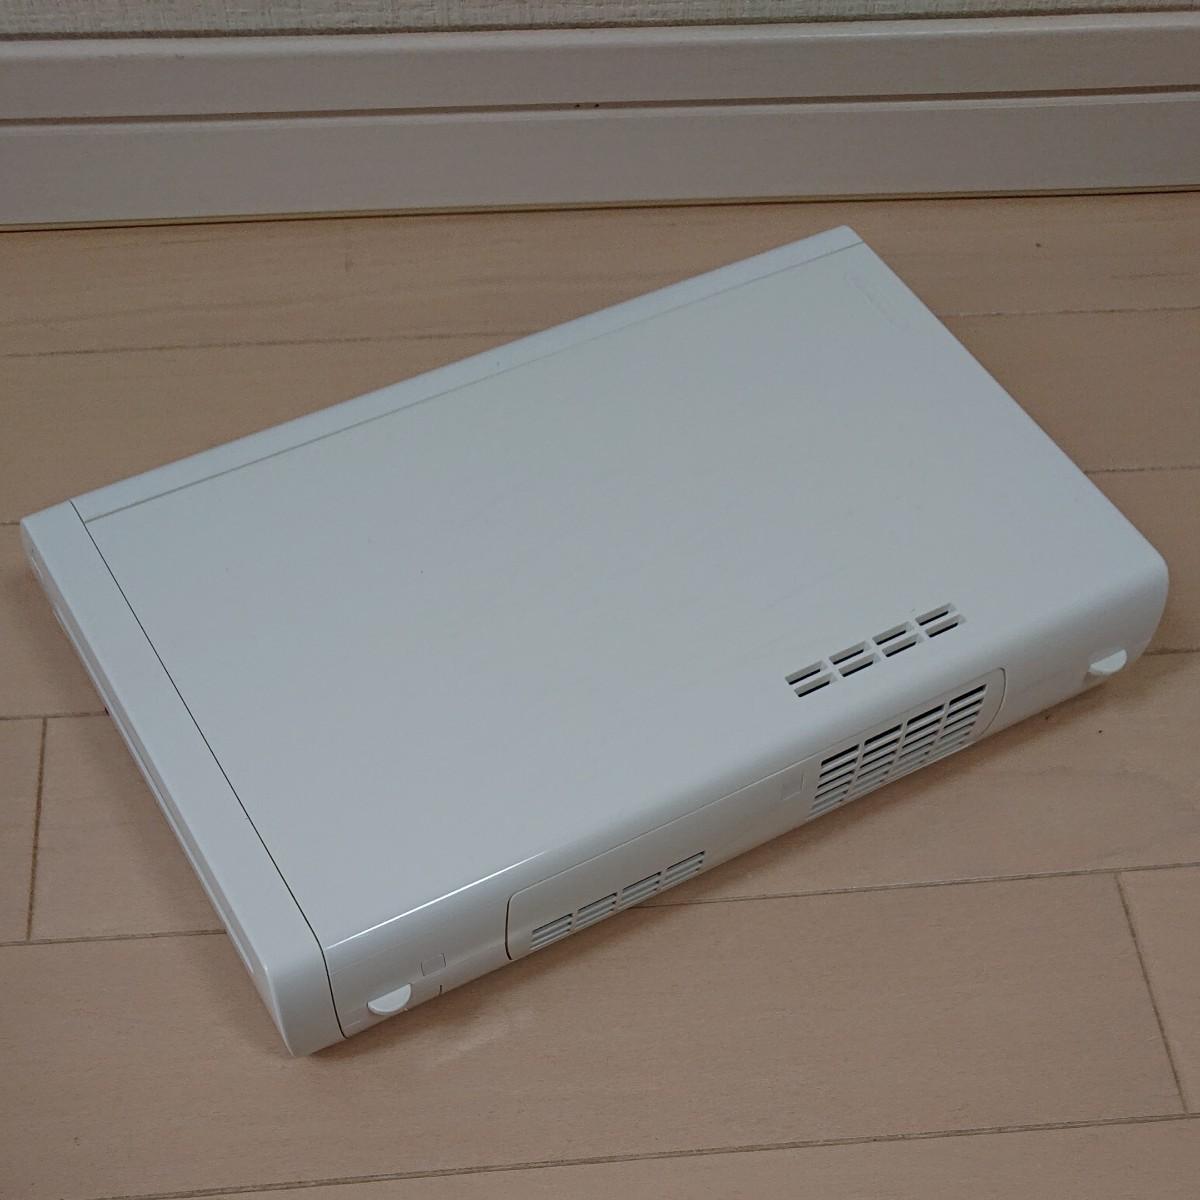 WiiU 白 8GB 本体のみ